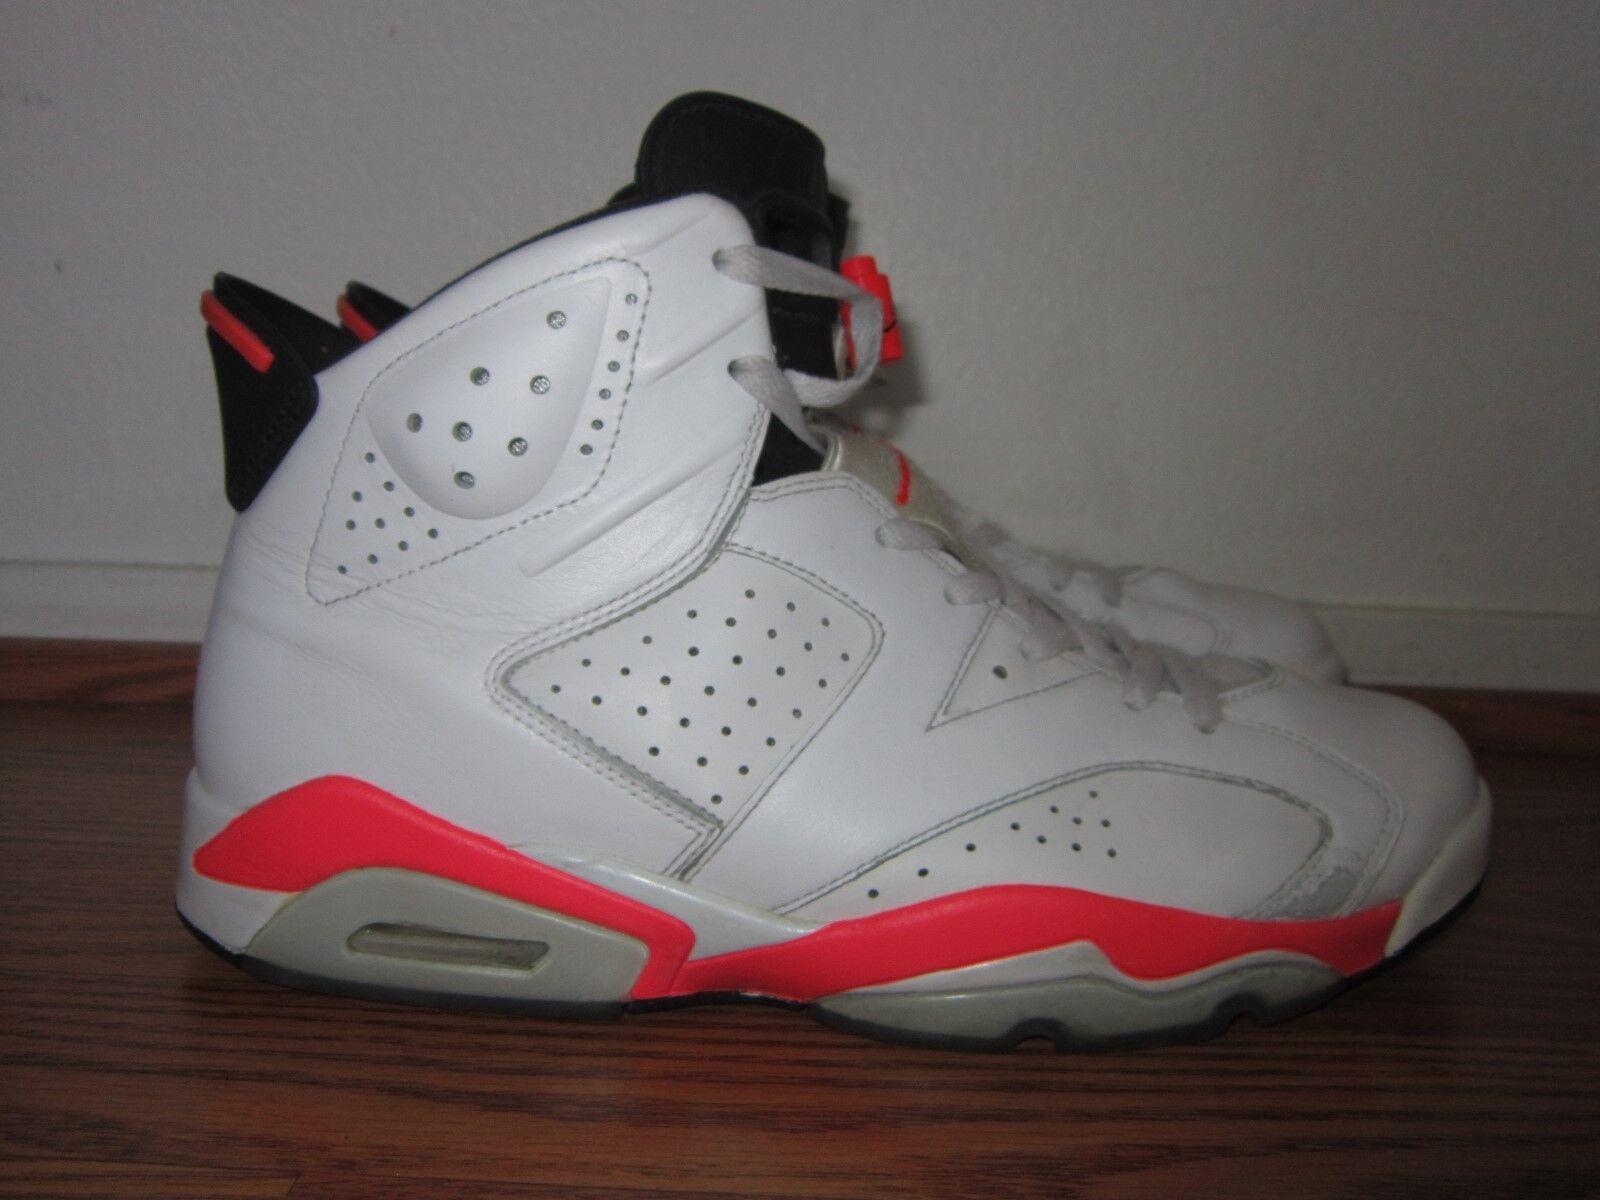 Nike Air Jordan 6 VI Retro INFRARED White Black 2014 Men's Size 12 DS 2014 Black 384664 123 02e7bb